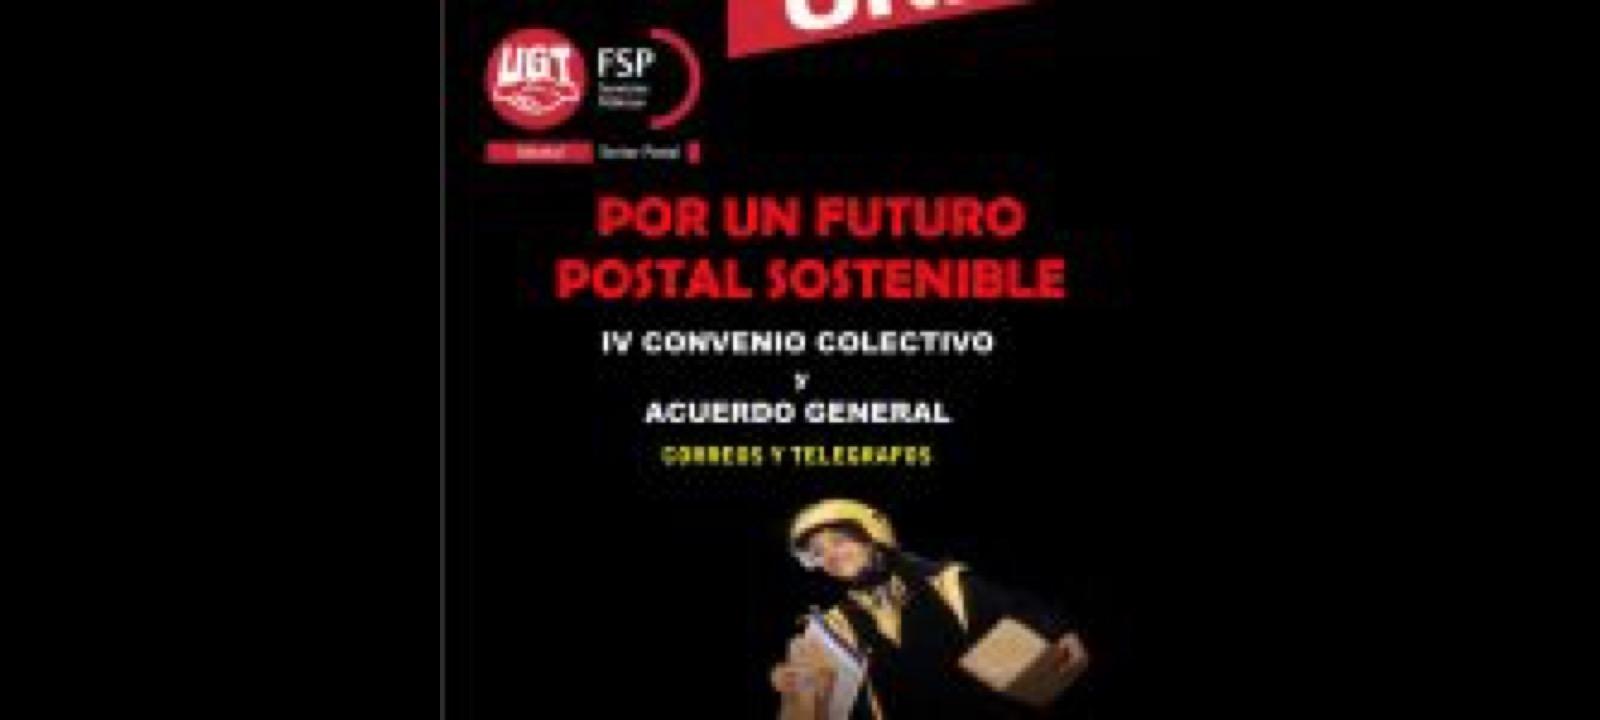 Sector Postal